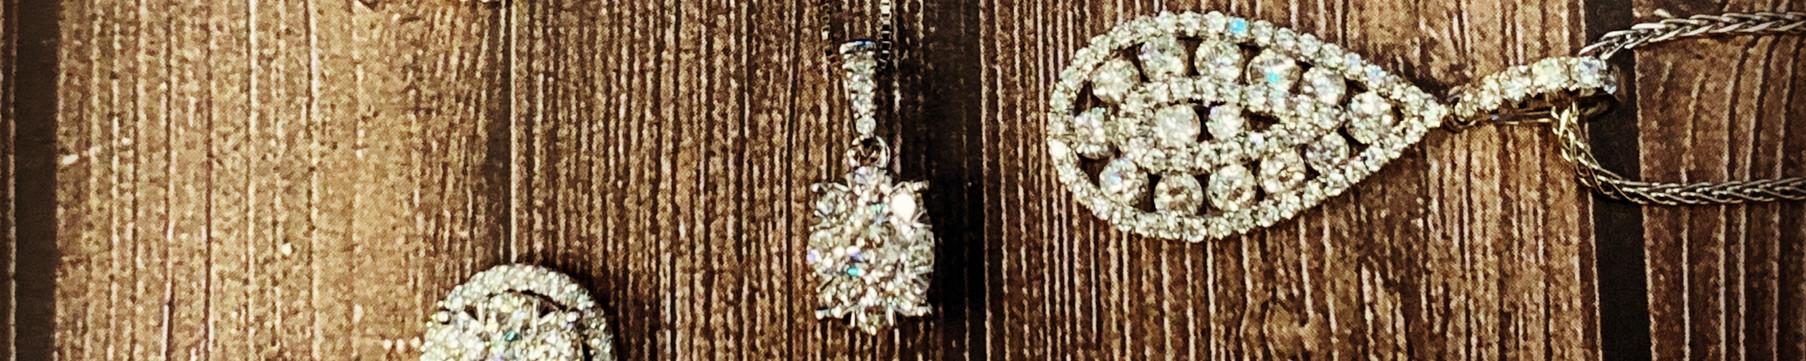 Pear Shaped Diamond Pendants